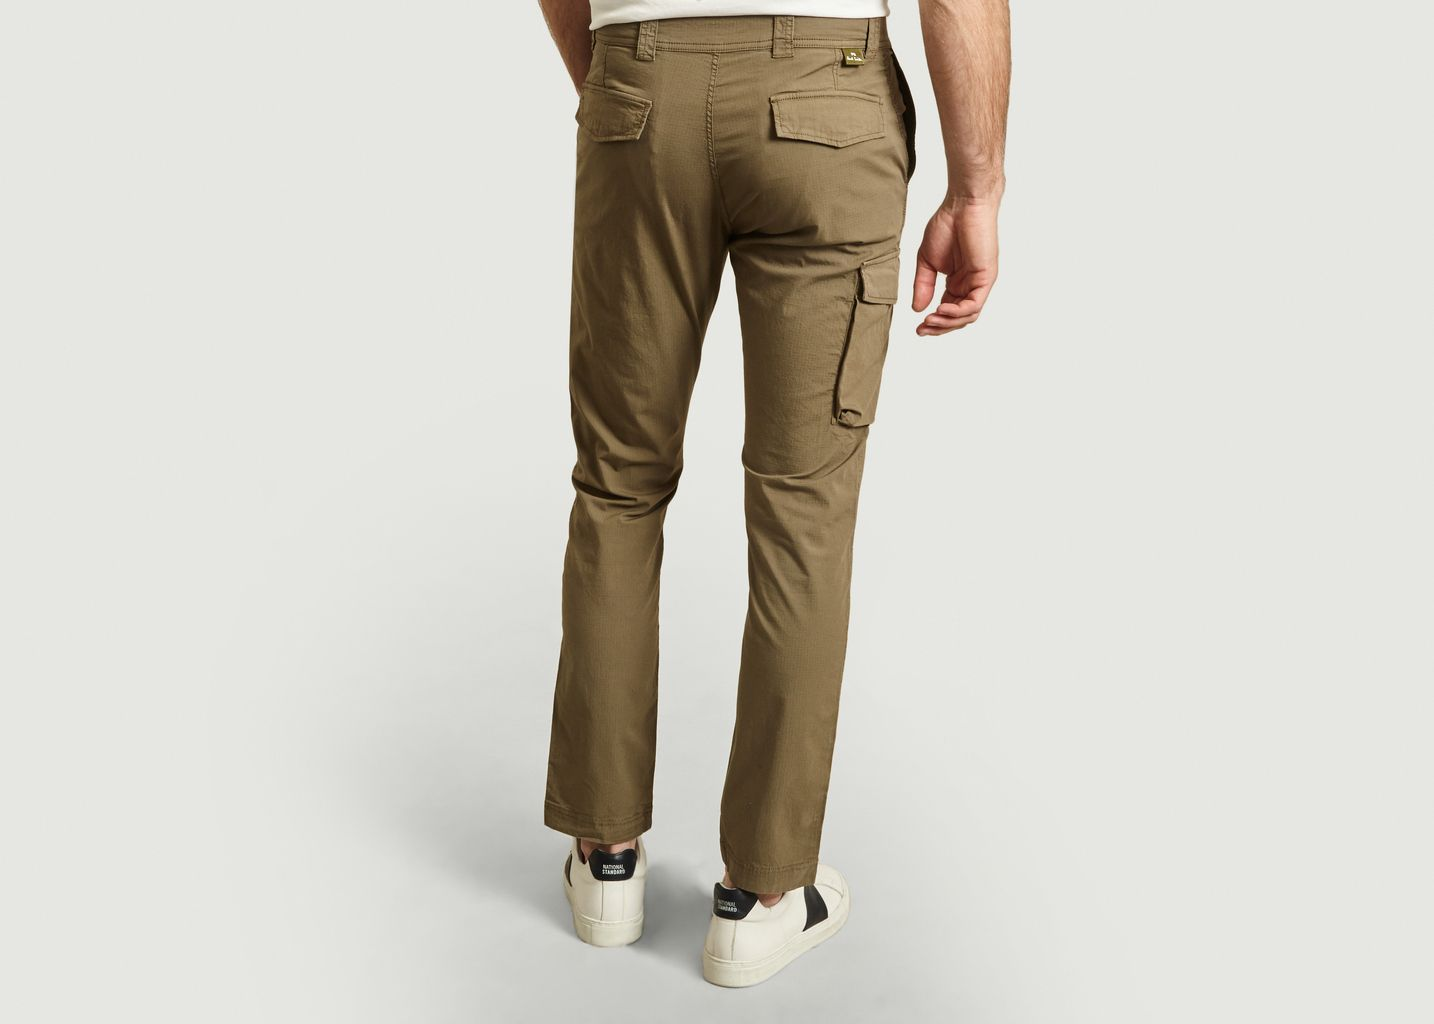 Pantalon militaire 7/8e - PS by PAUL SMITH